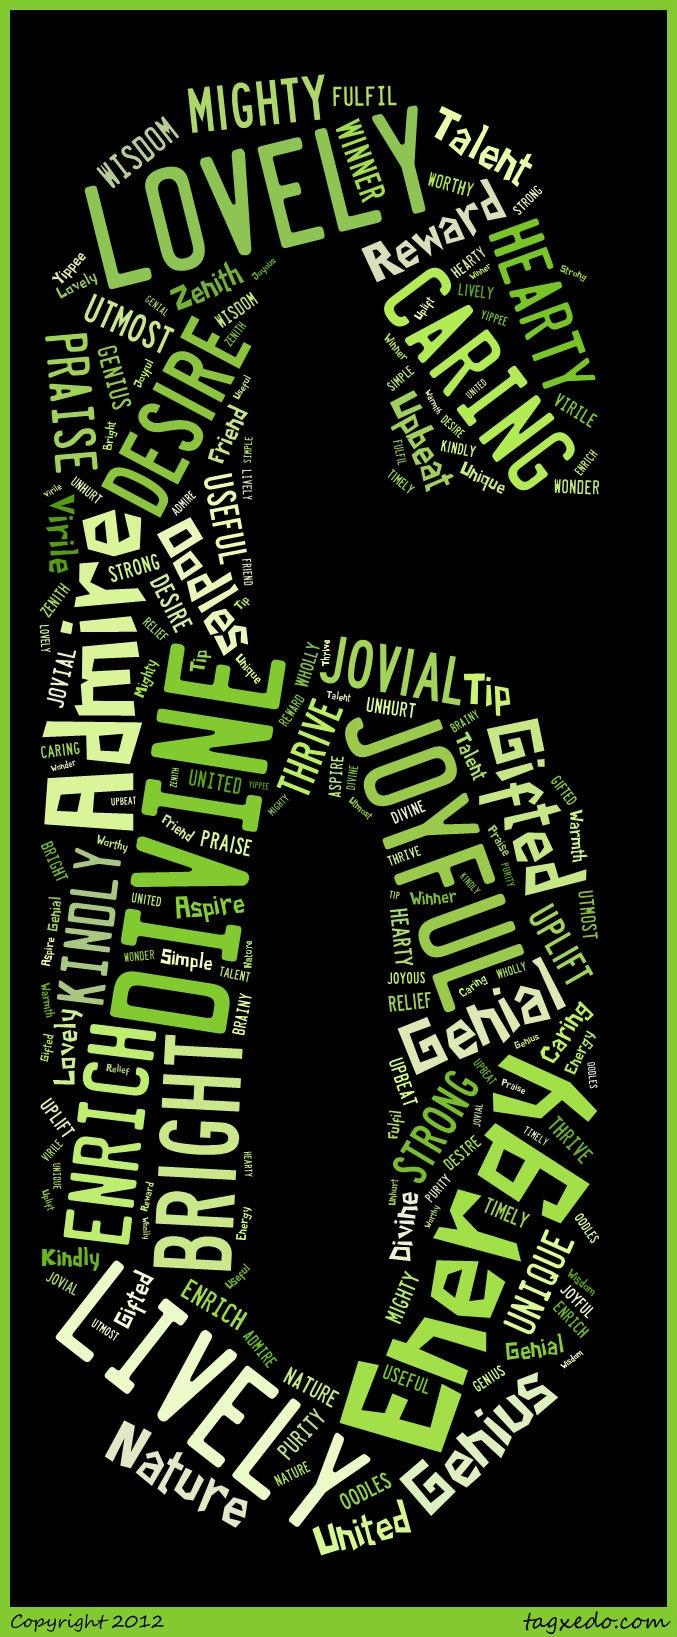 6letterwordstoinspire 6 letter words, Green quotes